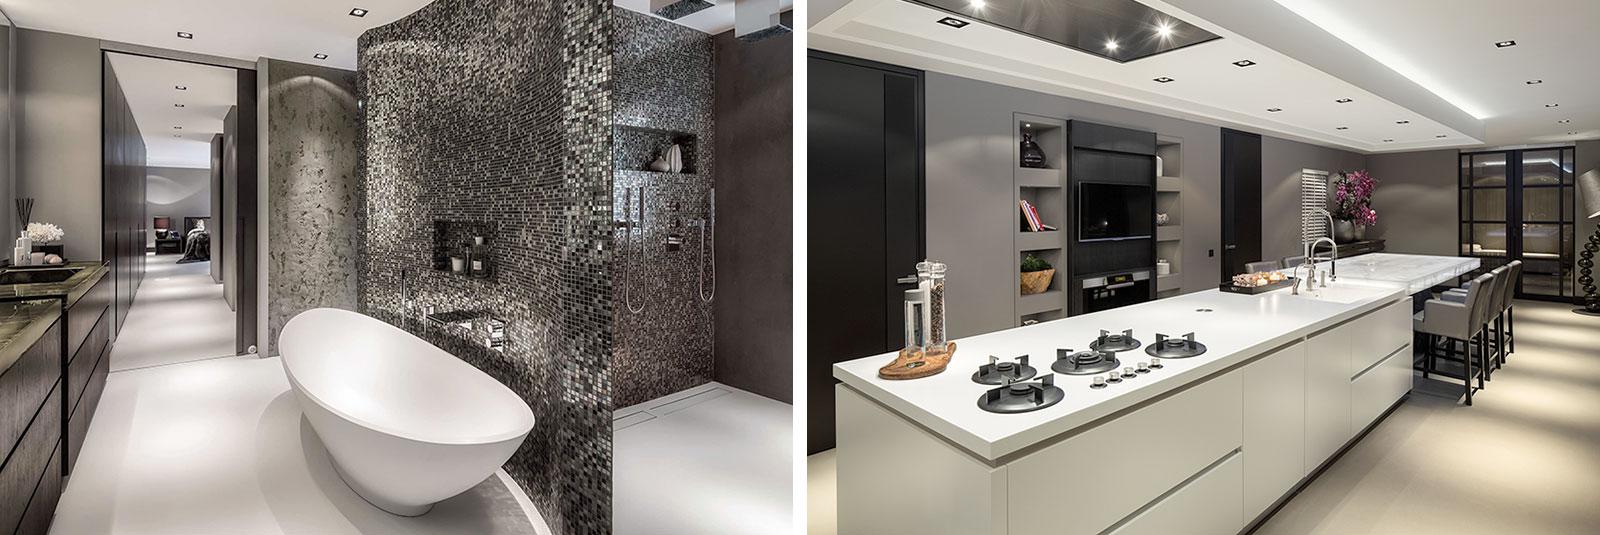 keuken en badkamer | digtotaal, Badkamer